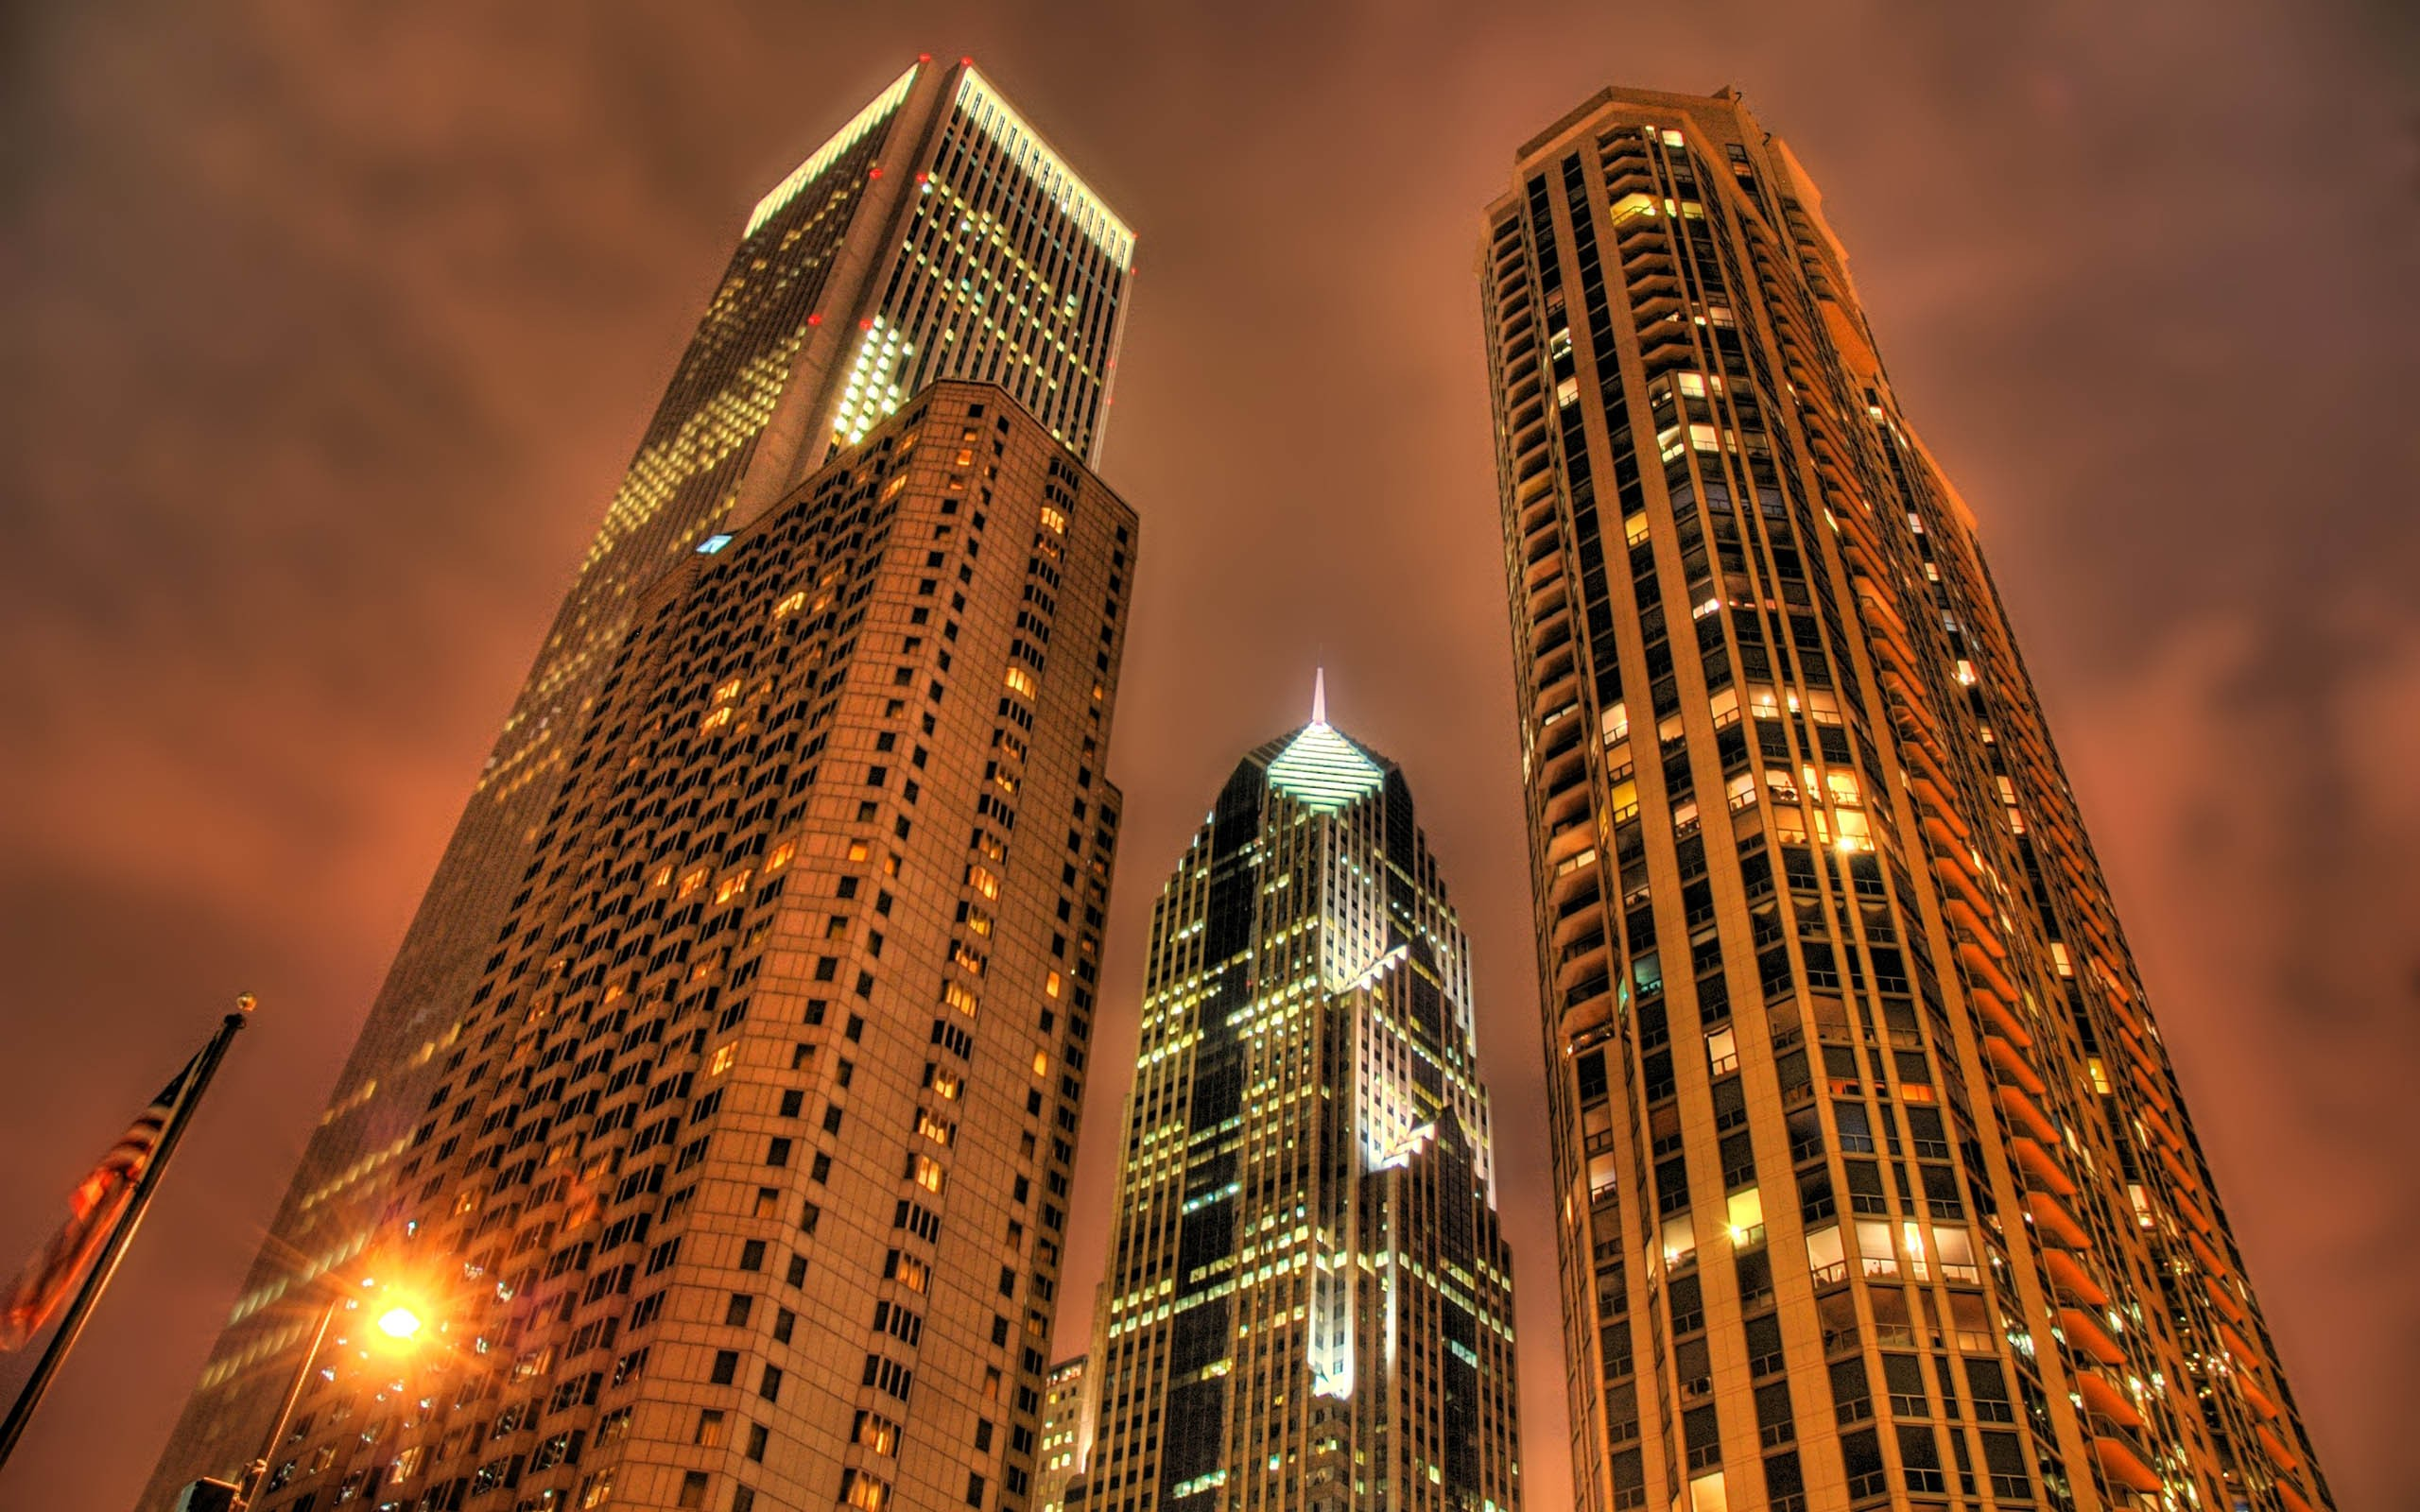 General 2560x1600 HDR cityscape Philadelphia night city lights USA